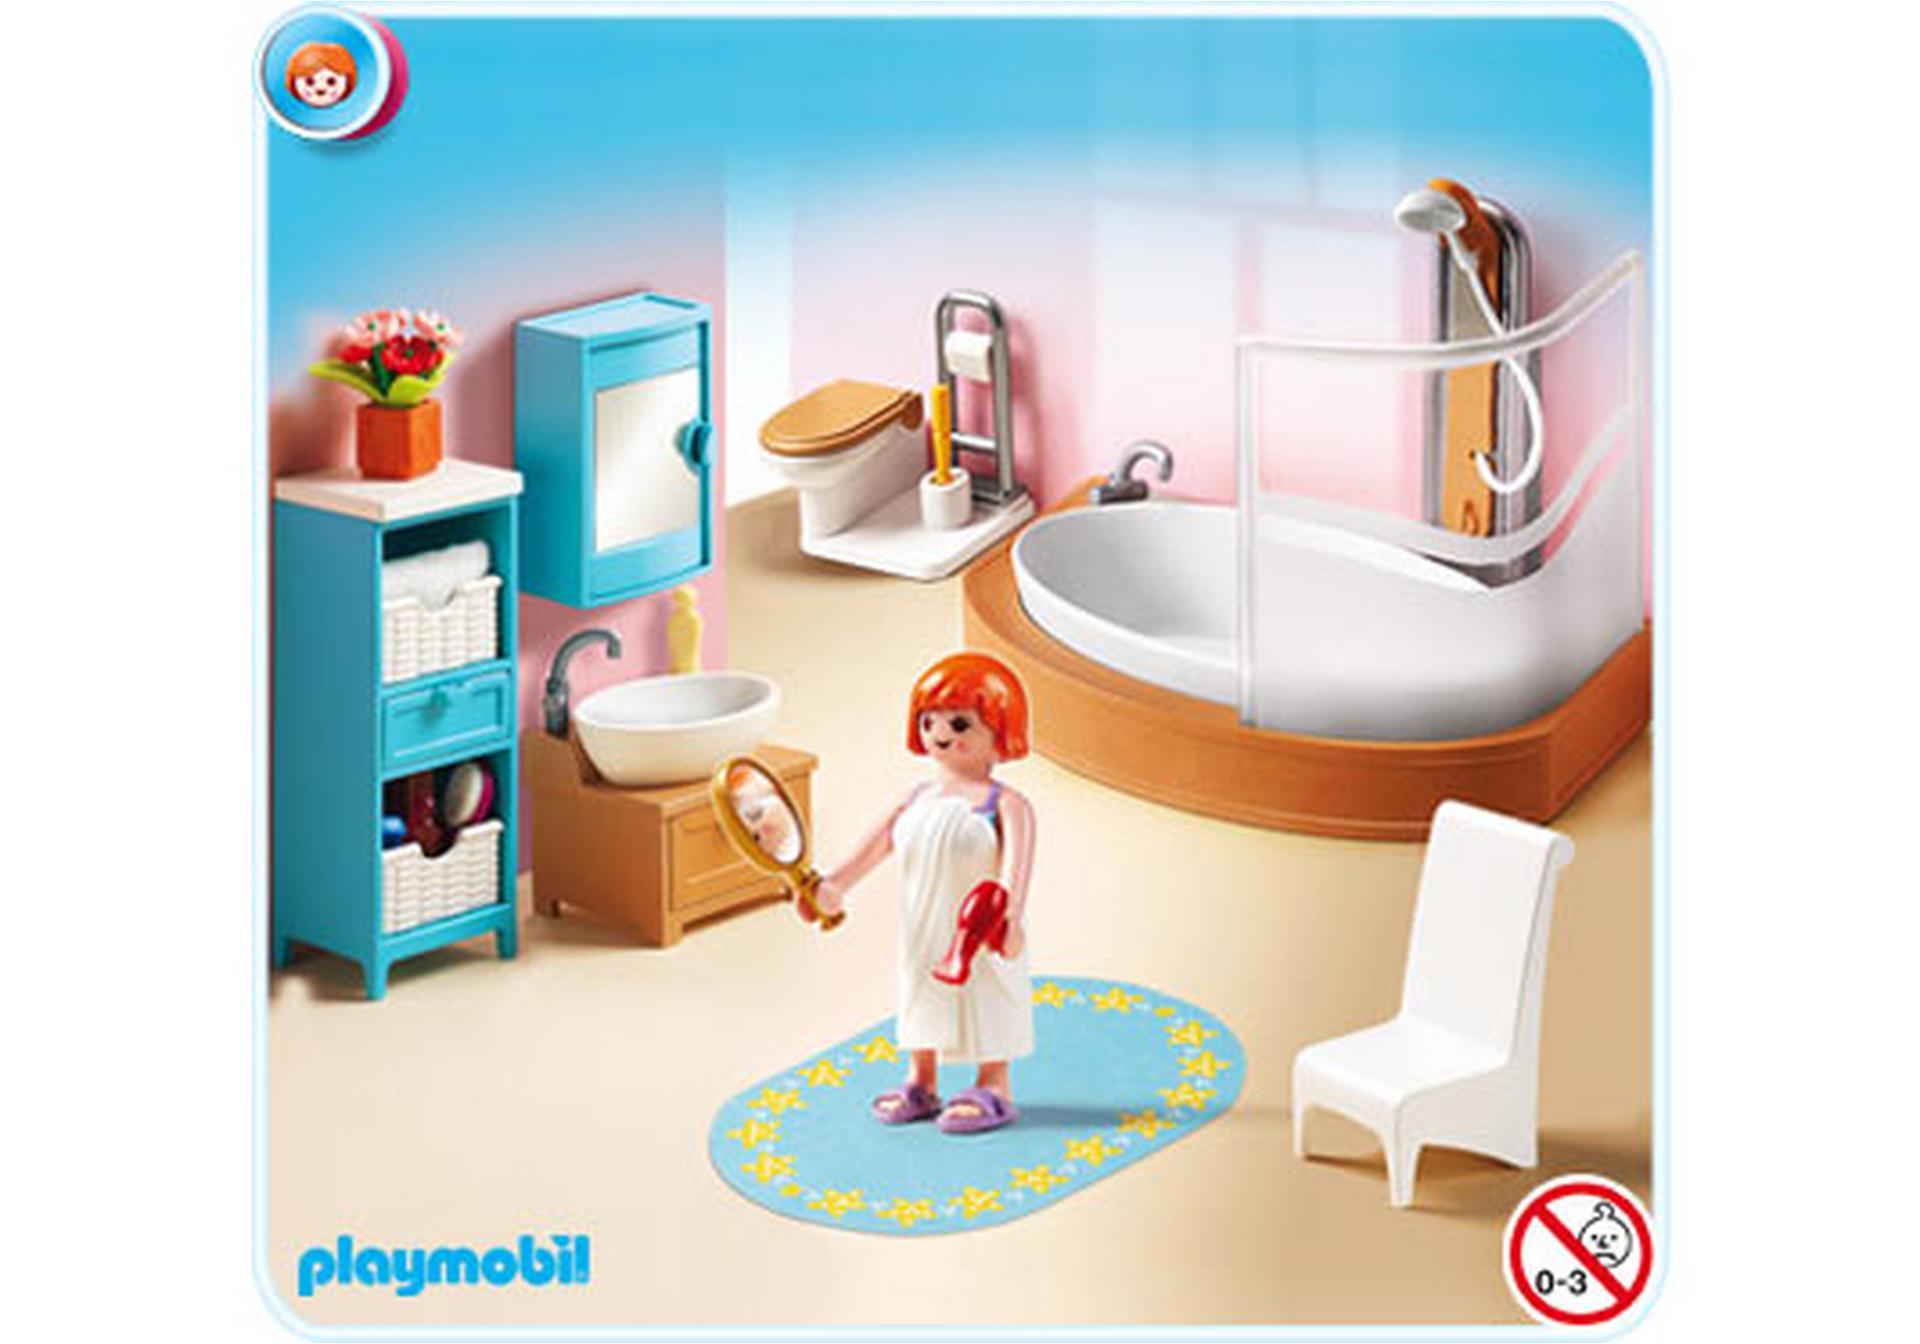 Badezimmer 5330 a playmobil deutschland for Salle de bain avec baignoire playmobil